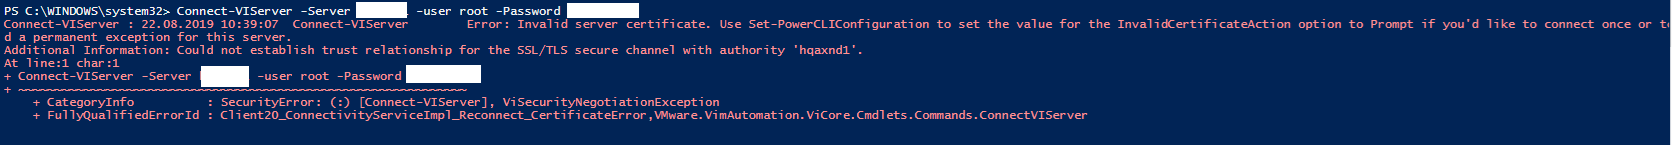 PowerCLI Invalid server certificate Hatası